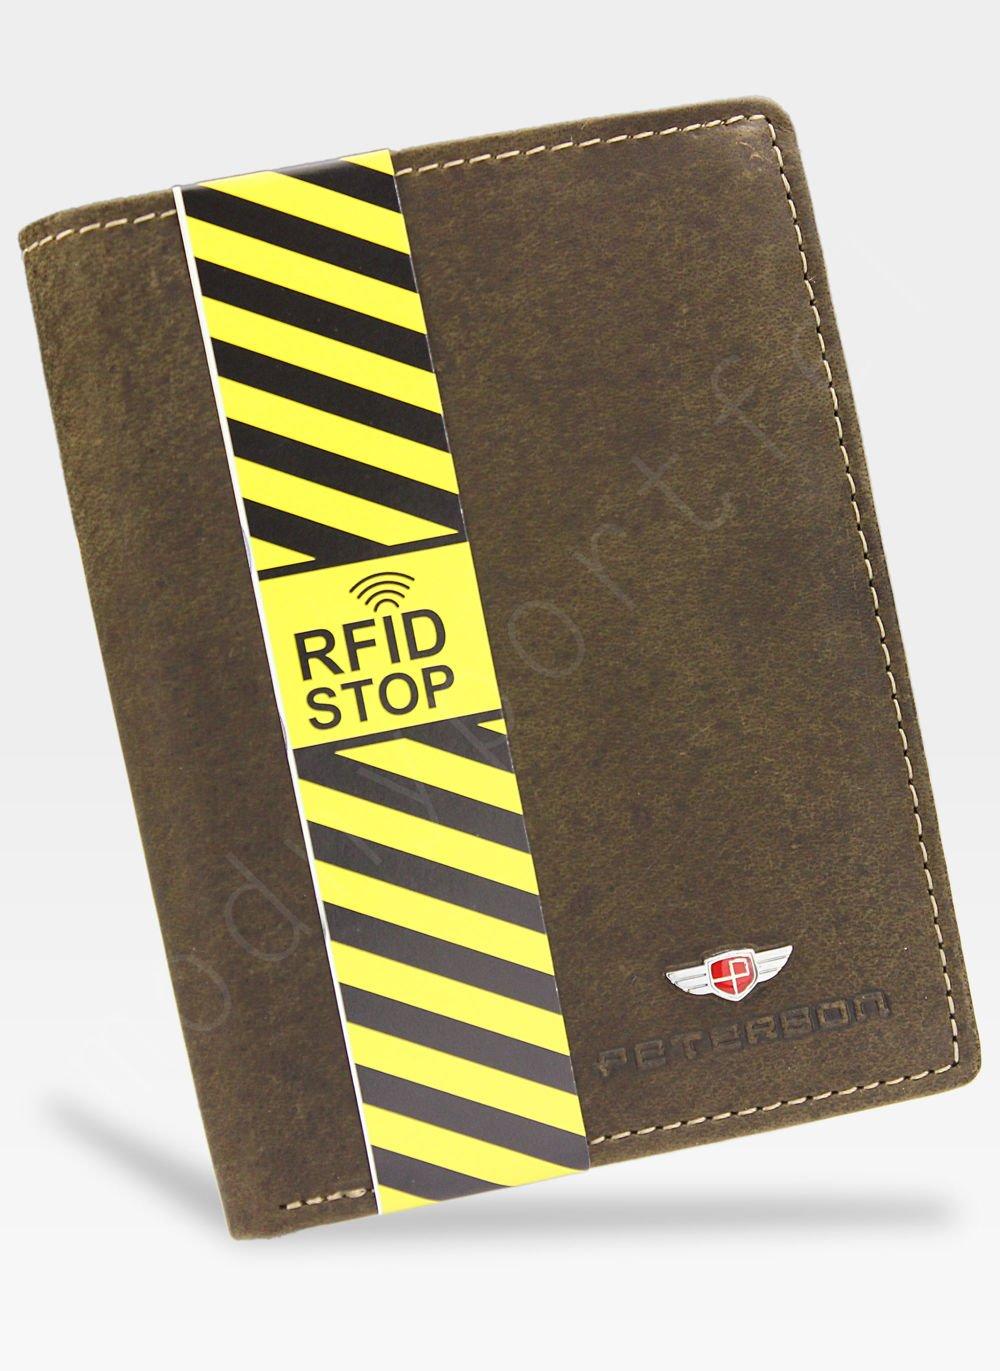 e3b65d54ad801 Portfel Męski Peterson Skórzany Brązowy 350 RFID STOP 350 2-1-4 RFID ...